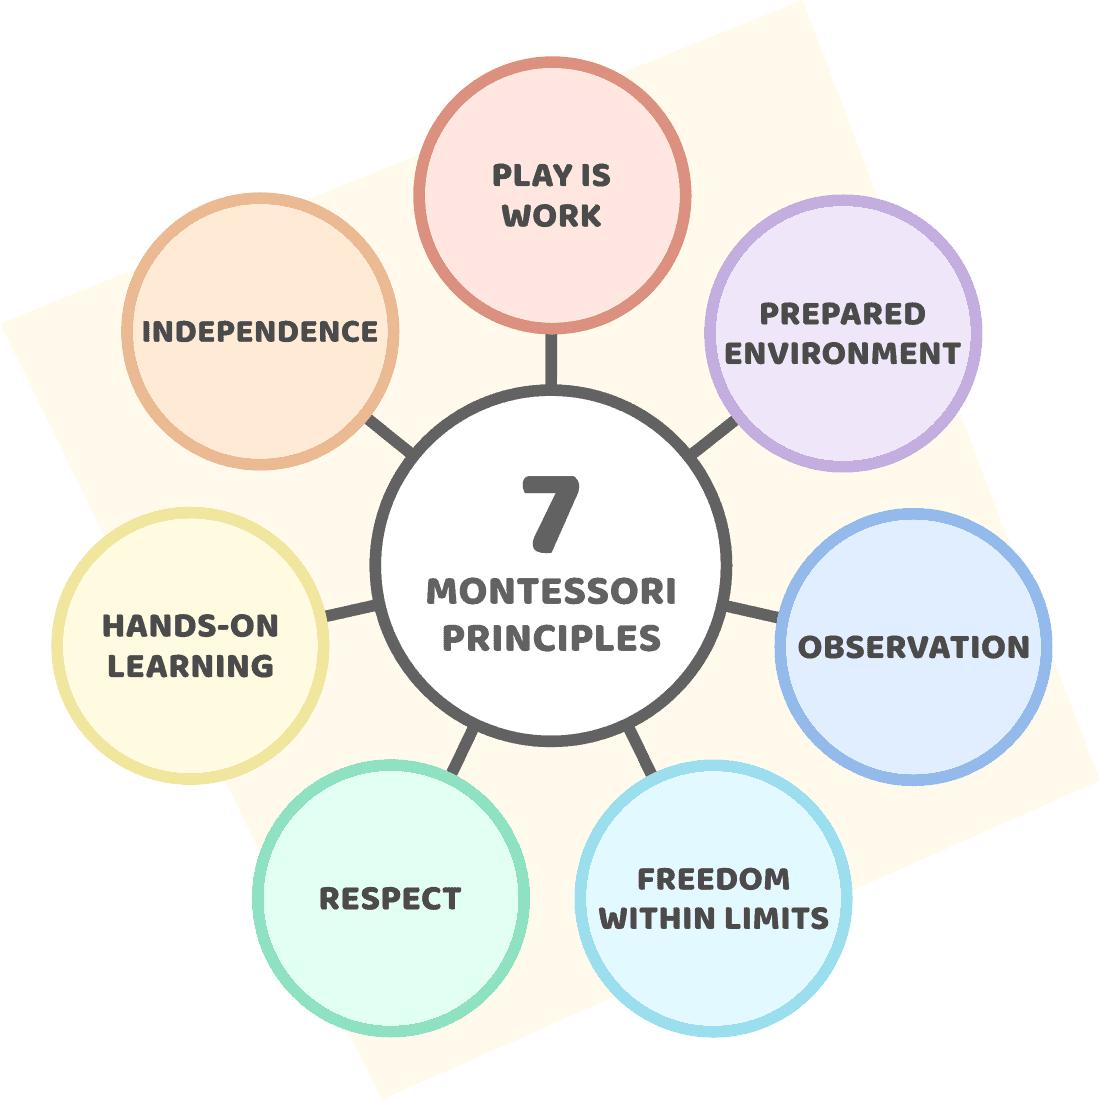 The principles of Montessori education